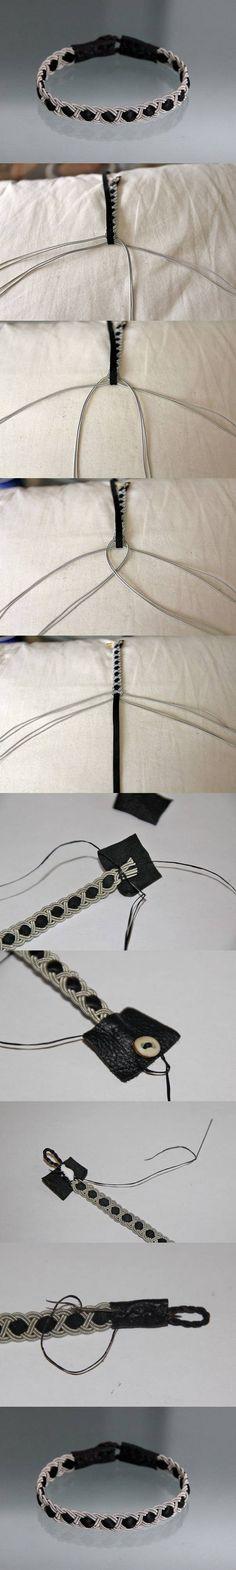 DIY Cute Rope Wristband